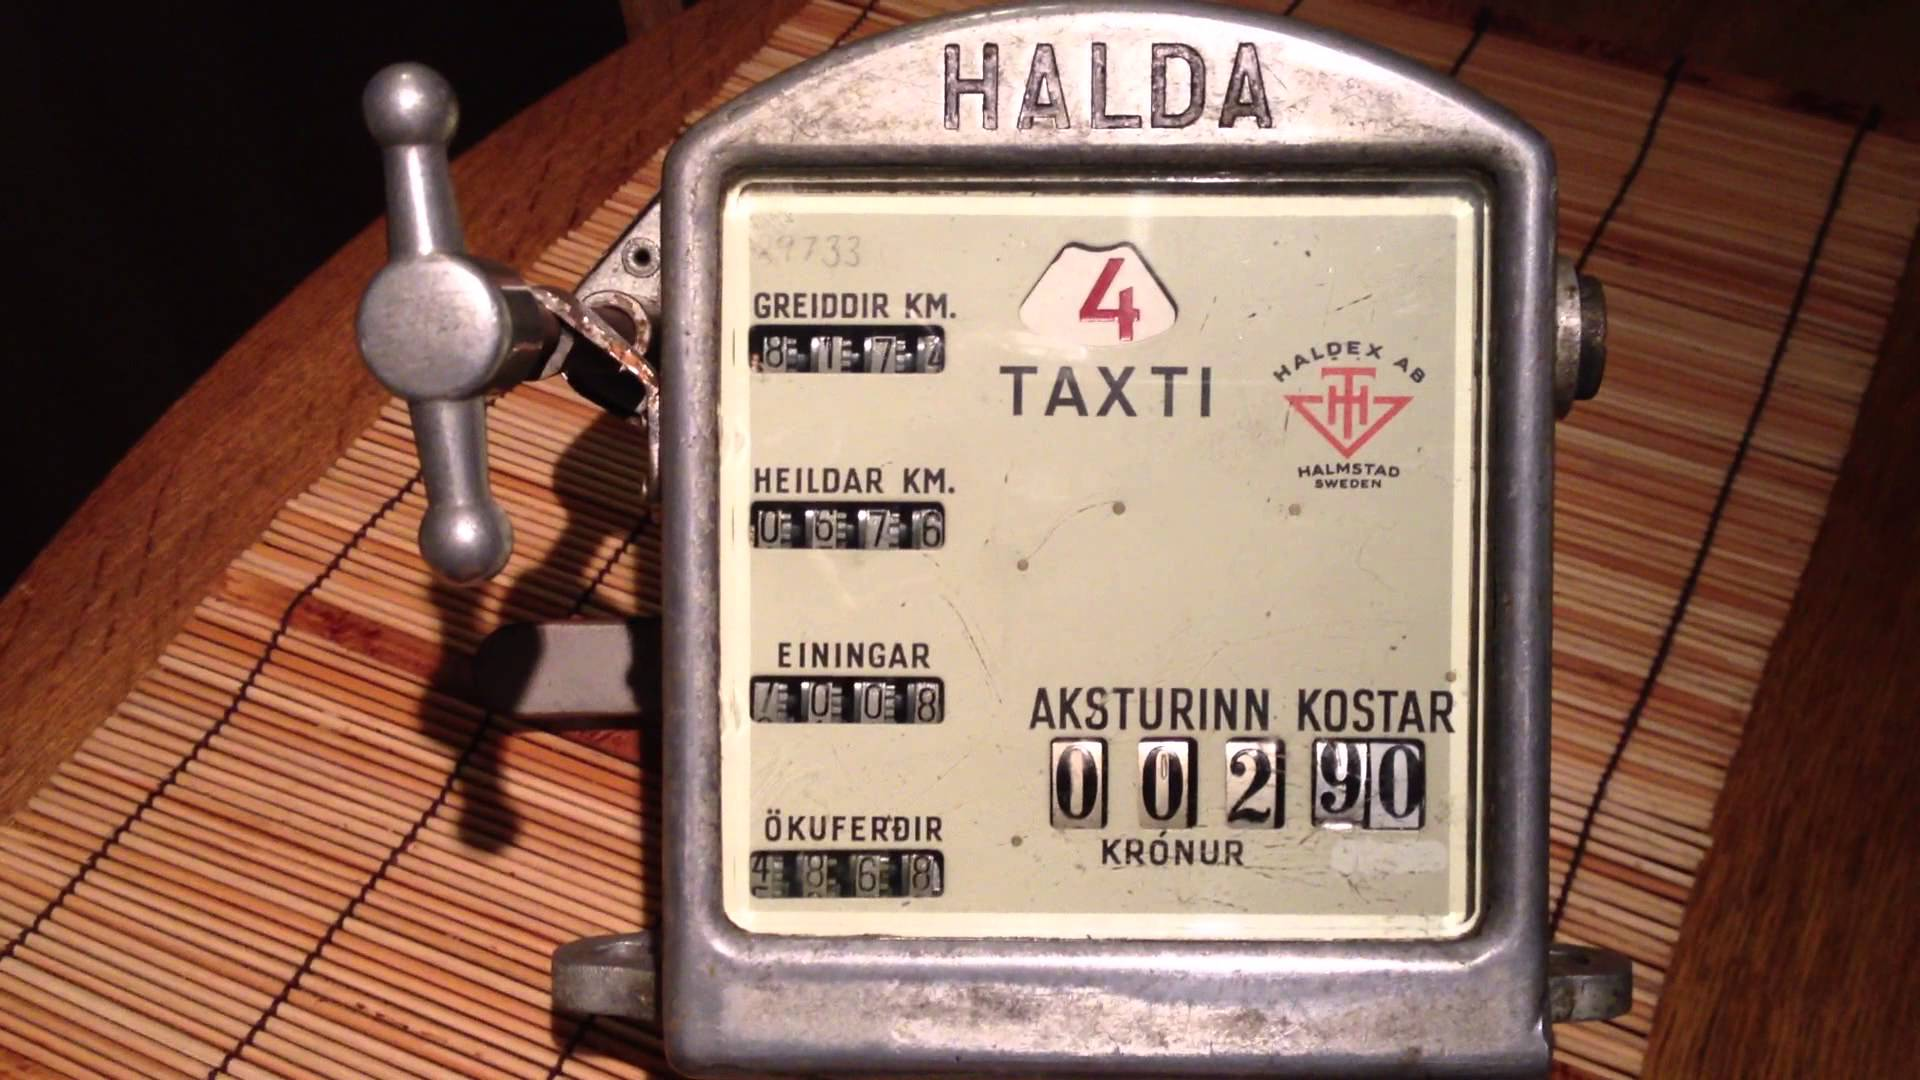 Hilda taxi meter